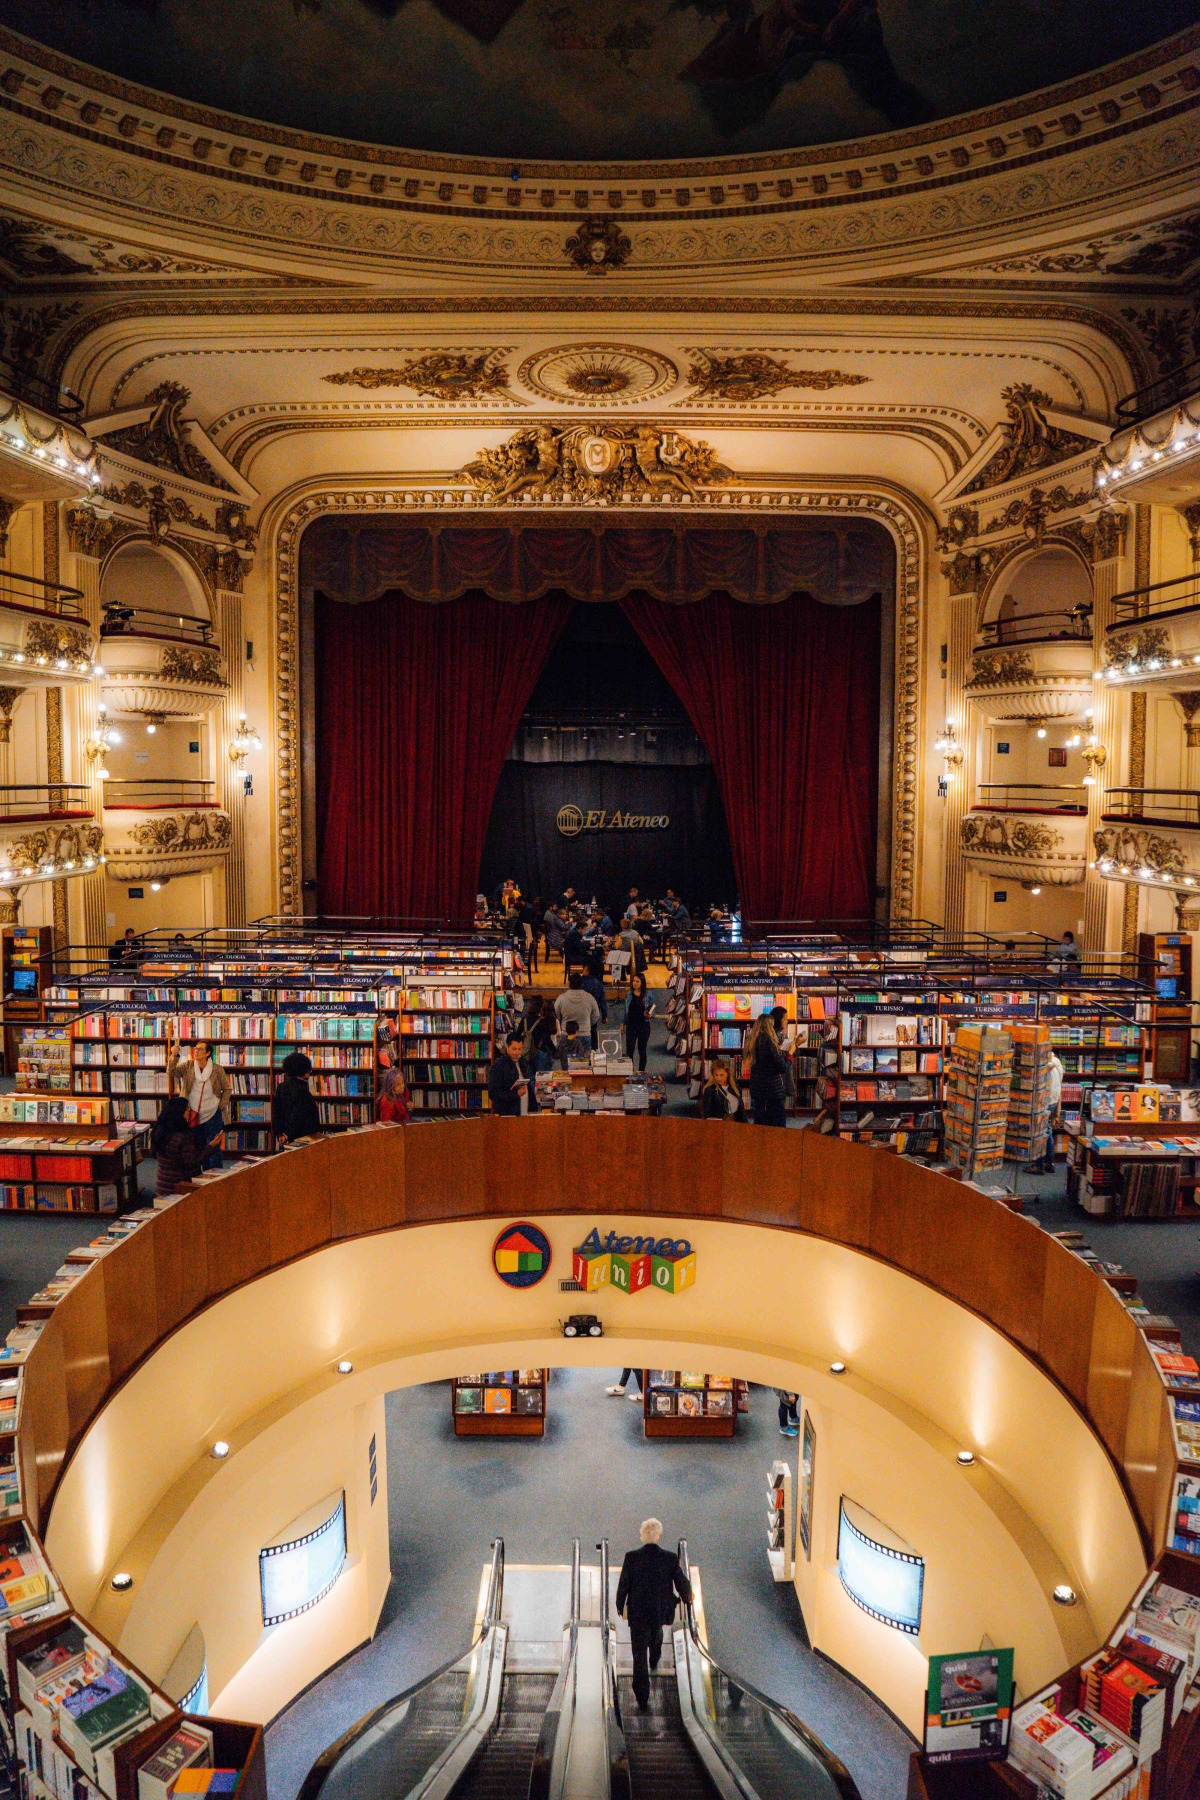 Coolest bookstore ever!